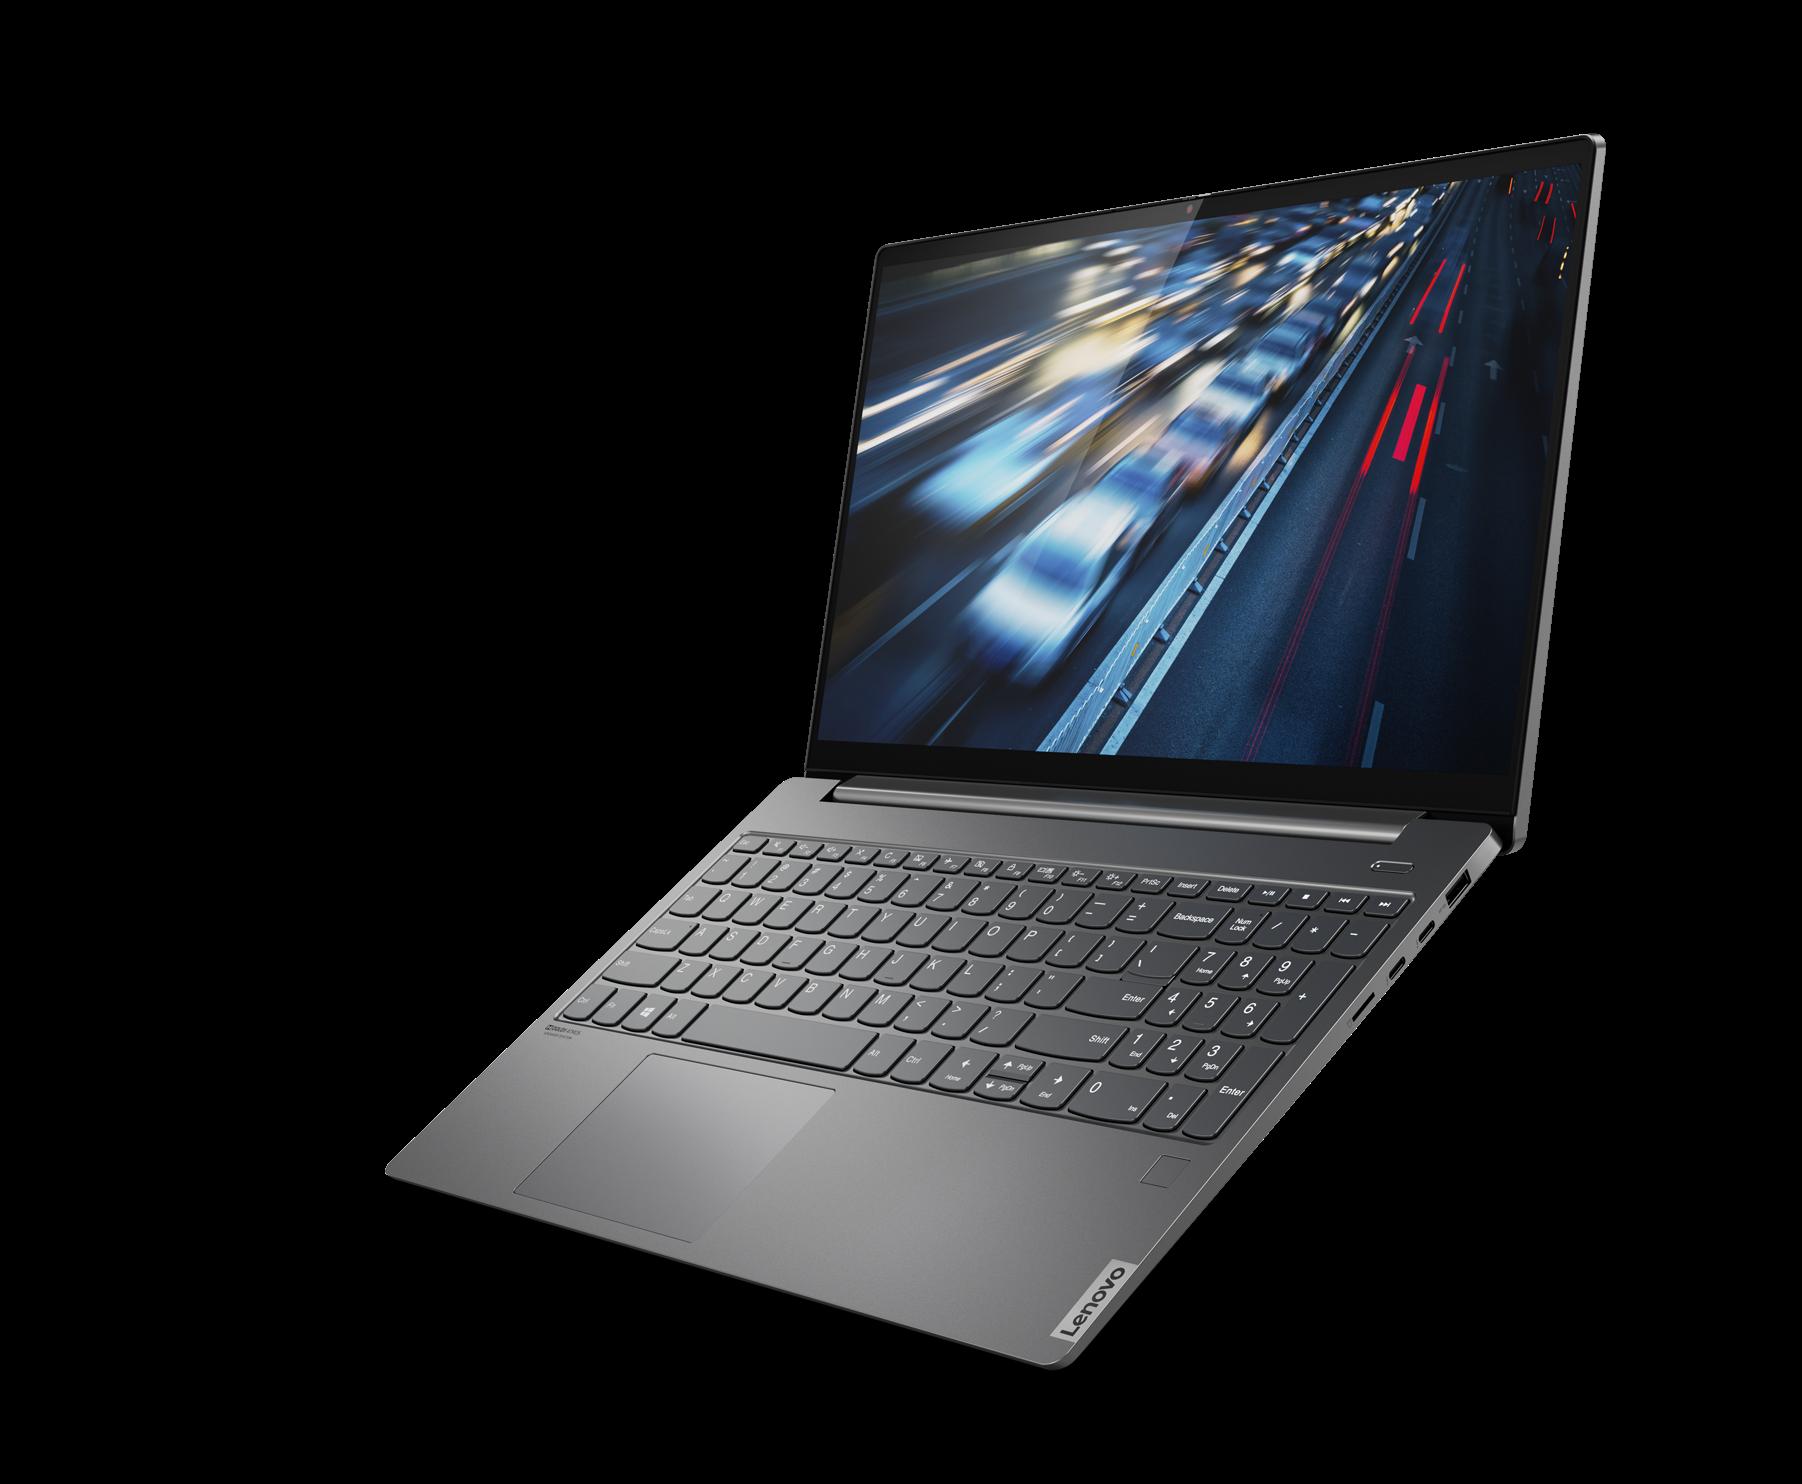 Lenovo Yoga S740 15inch Iron Grey Entertainment Lenovo